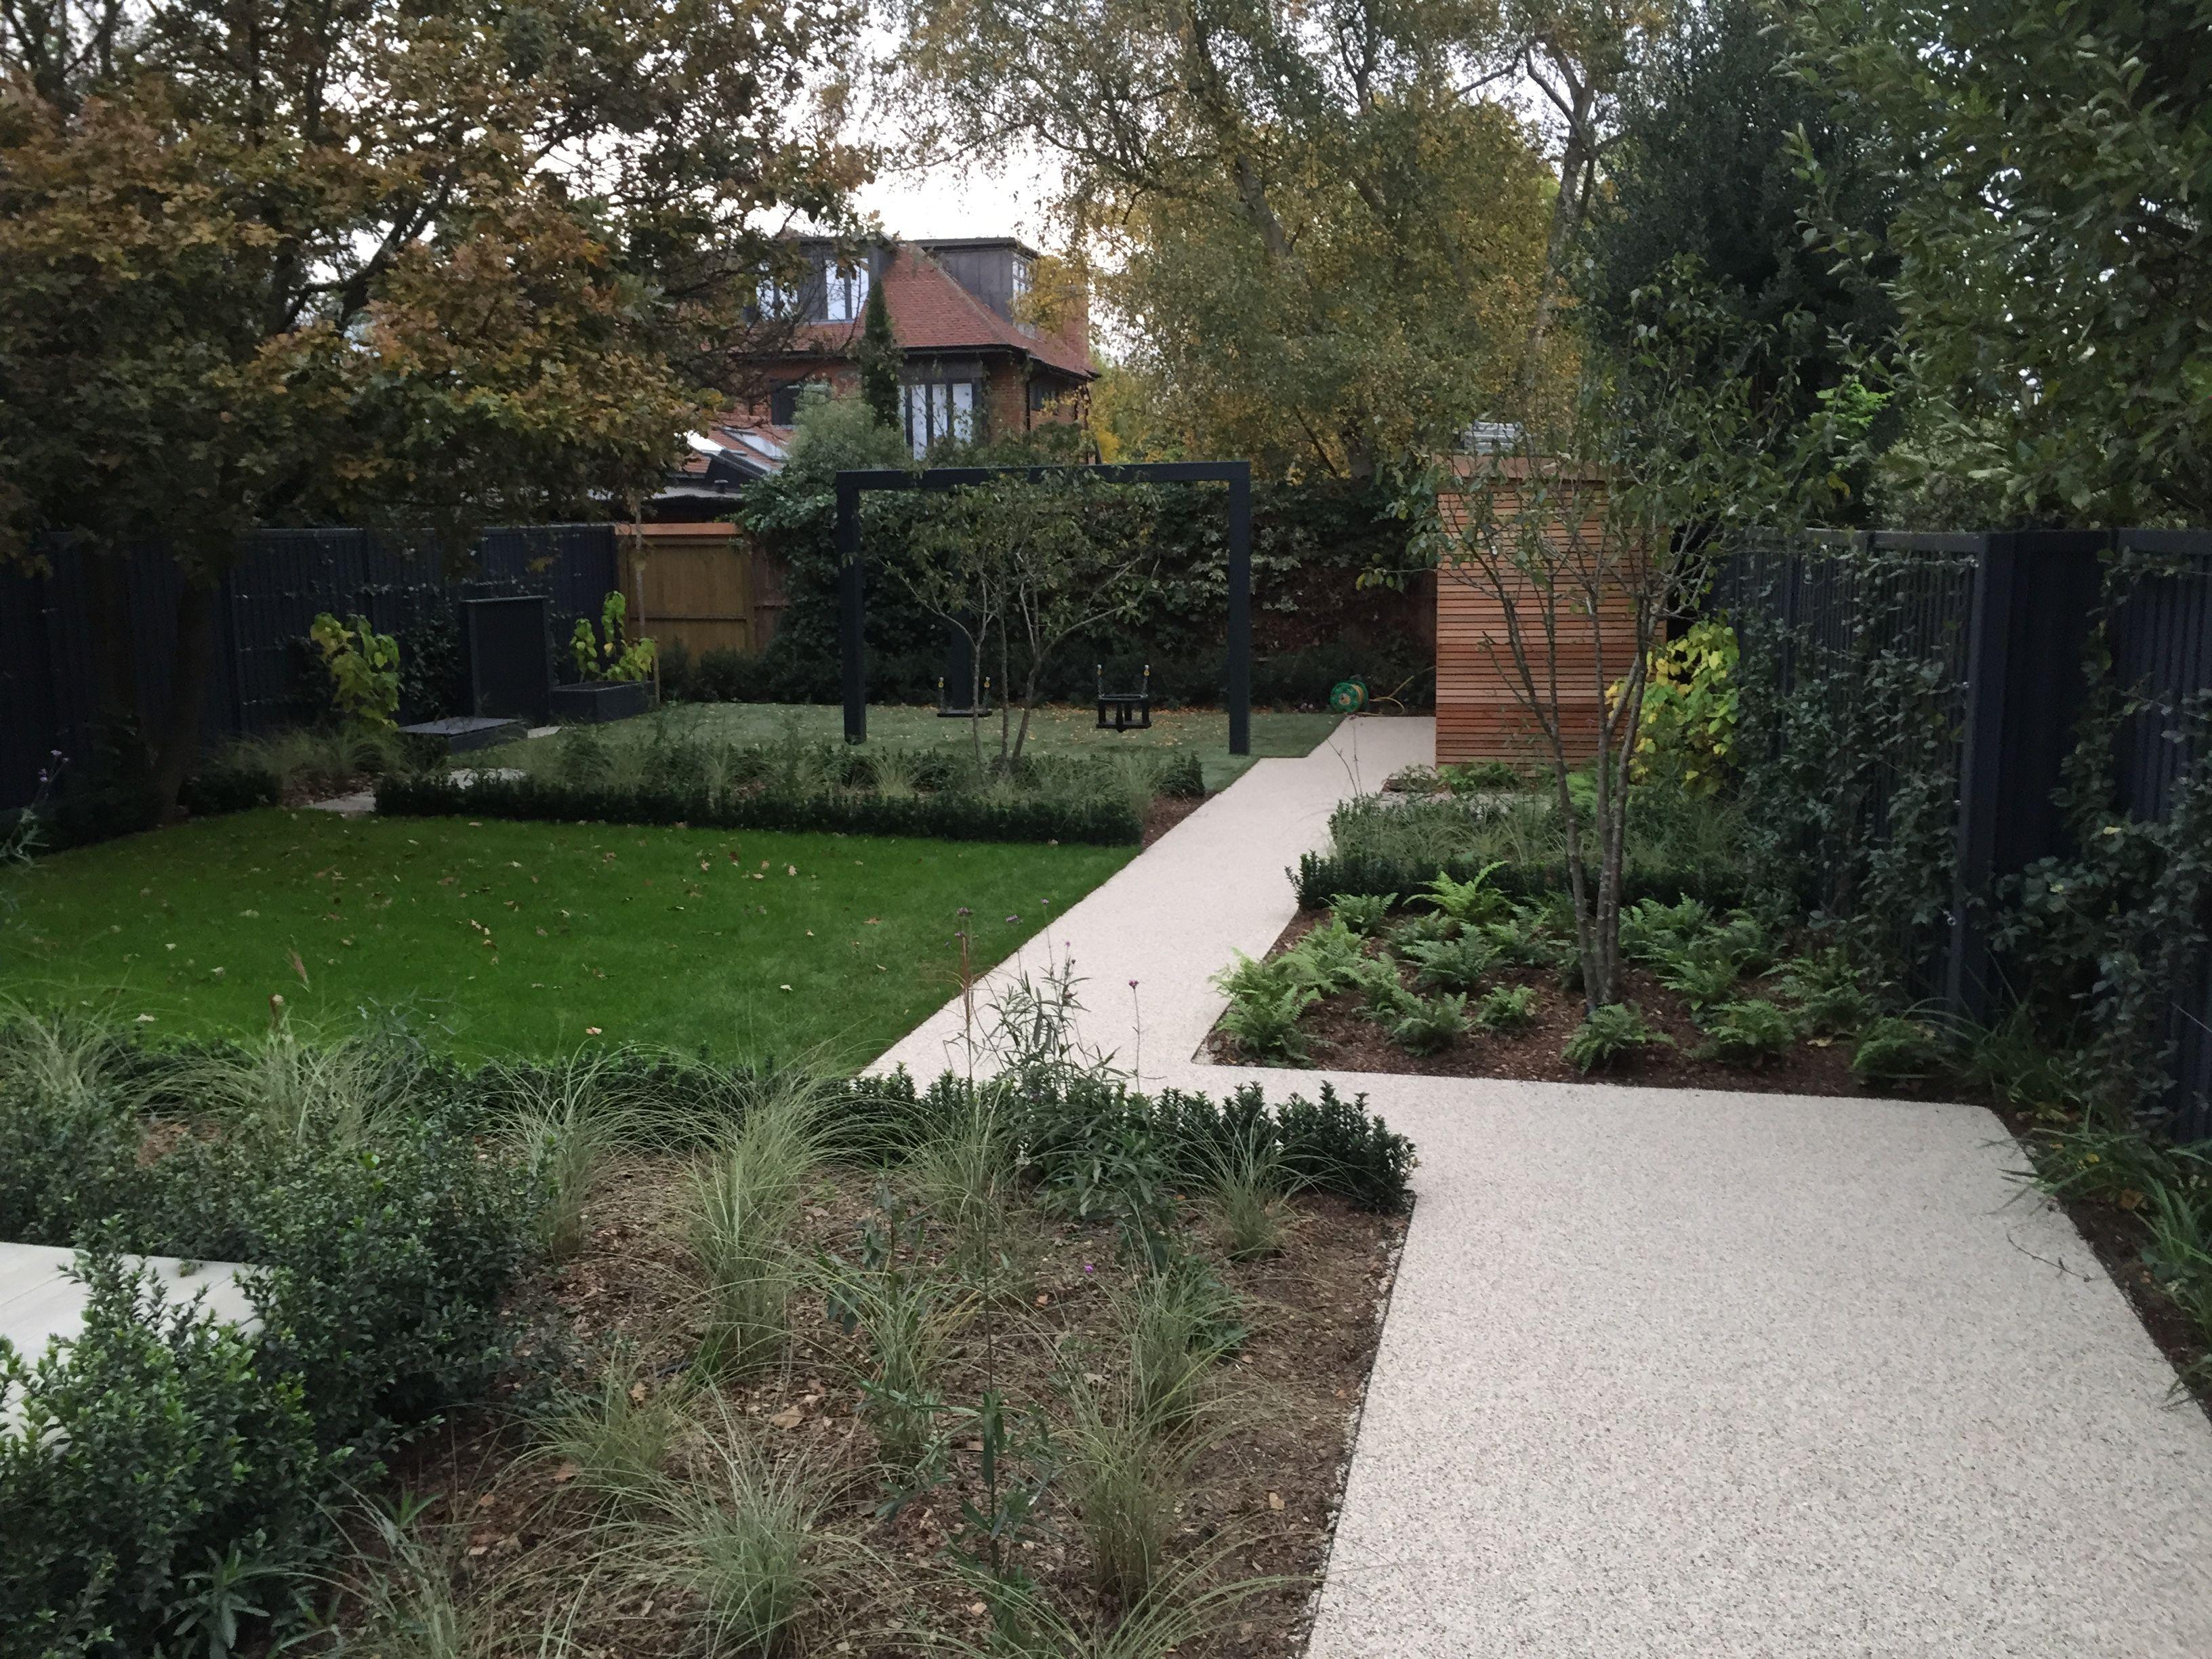 Chic modern garden design in chelsea by declan buckley with steps and - Design Declan Buckley Building Natures Balance Landscapes Planting Koru Gardens Resin Bound